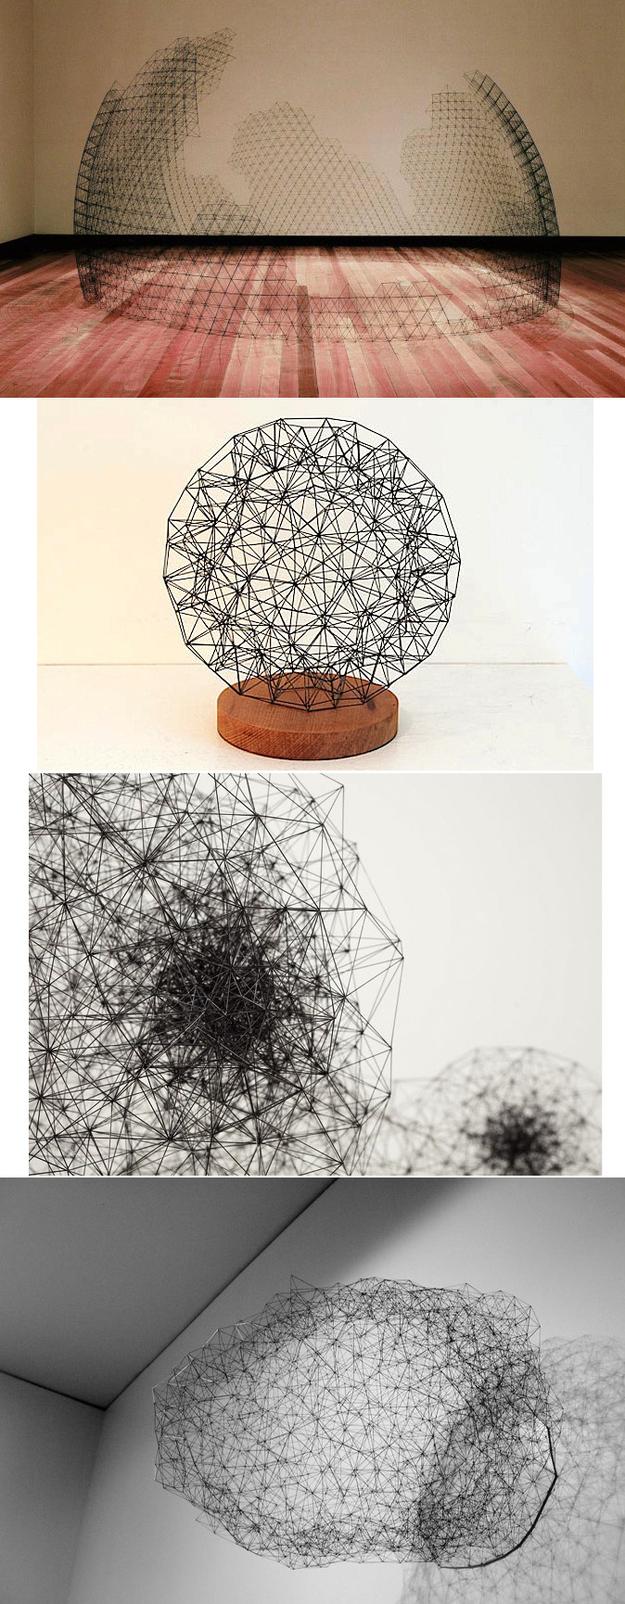 peter-trevelyan-5mm-pencil-lead-sculptures-1.jpg